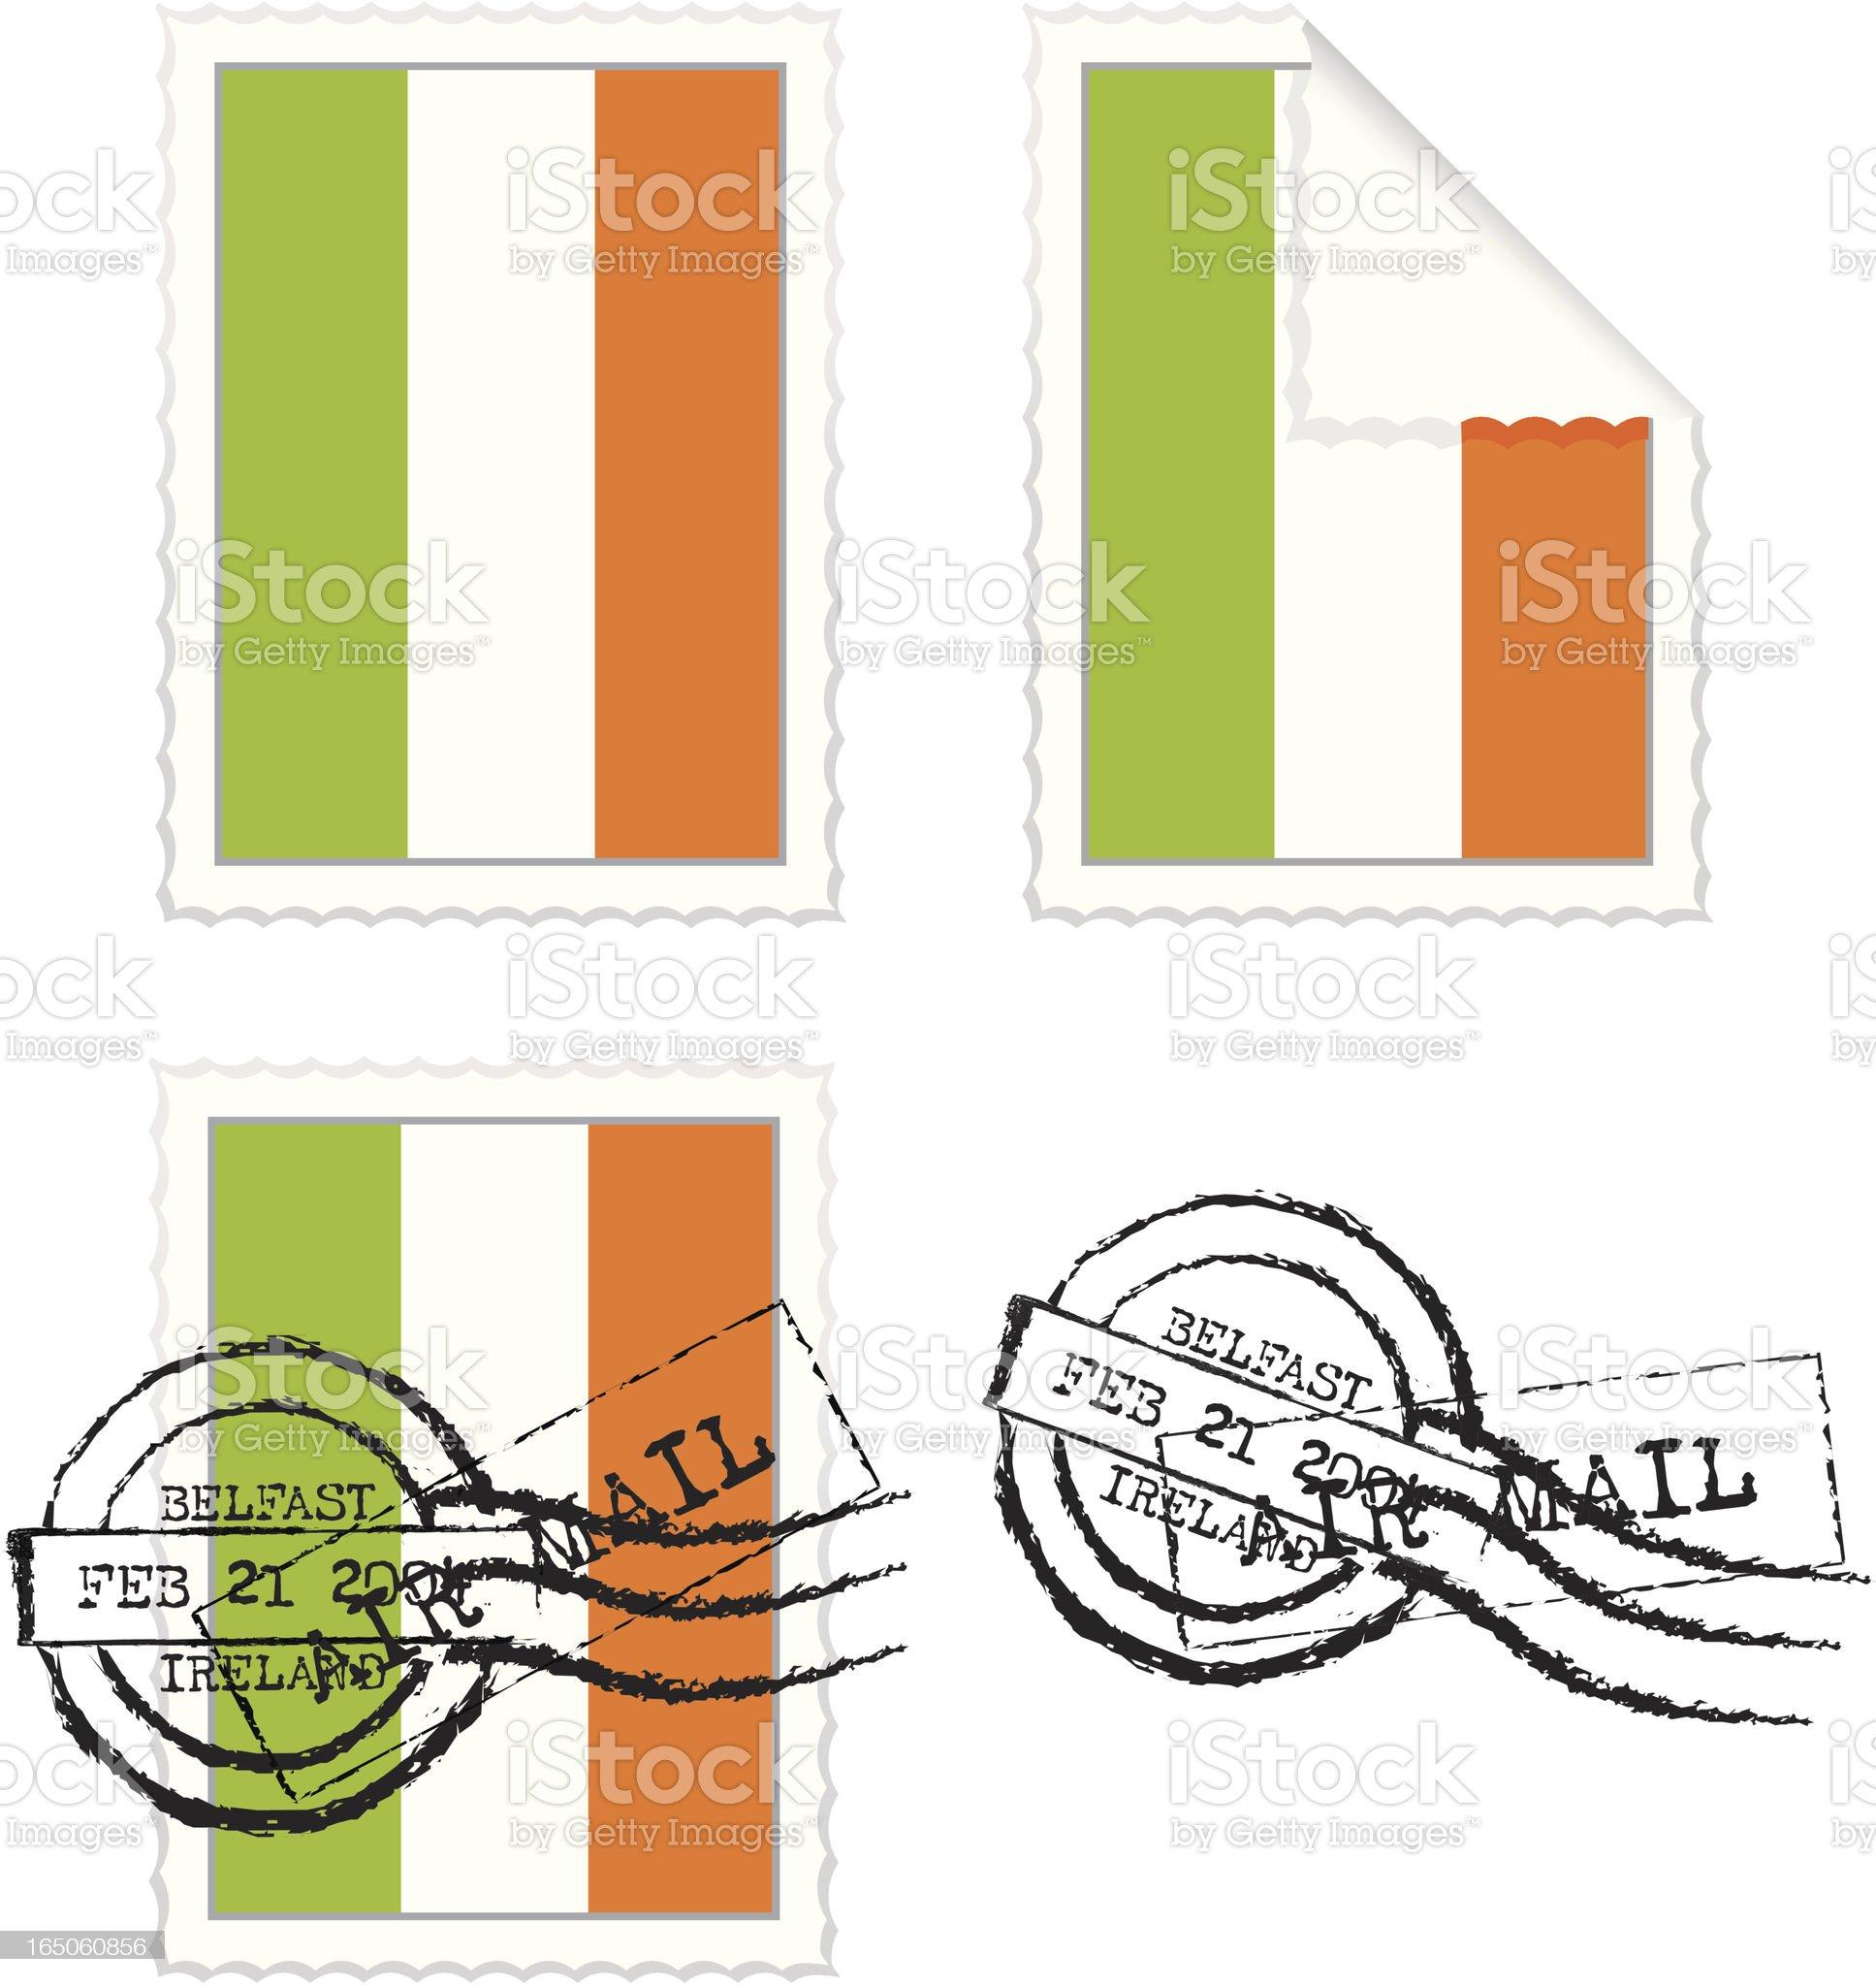 Irish Flag Stamp Set royalty-free stock vector art